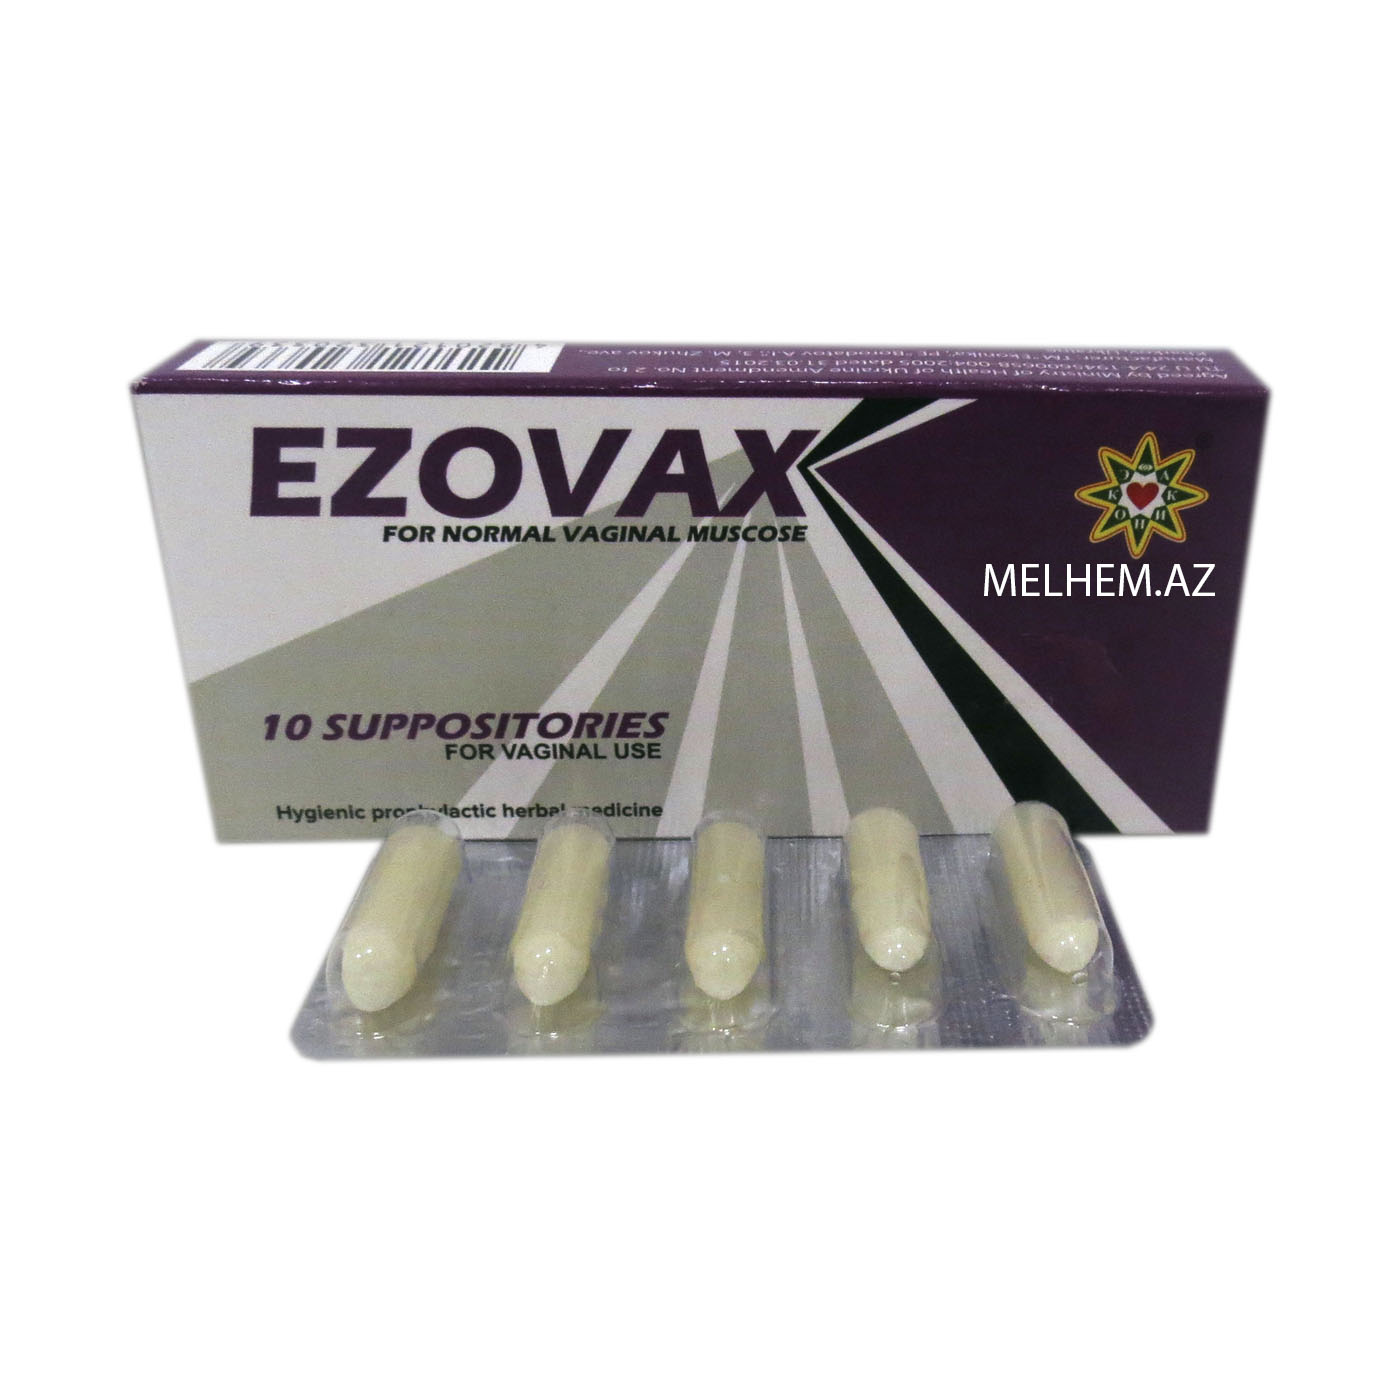 EZOVAX